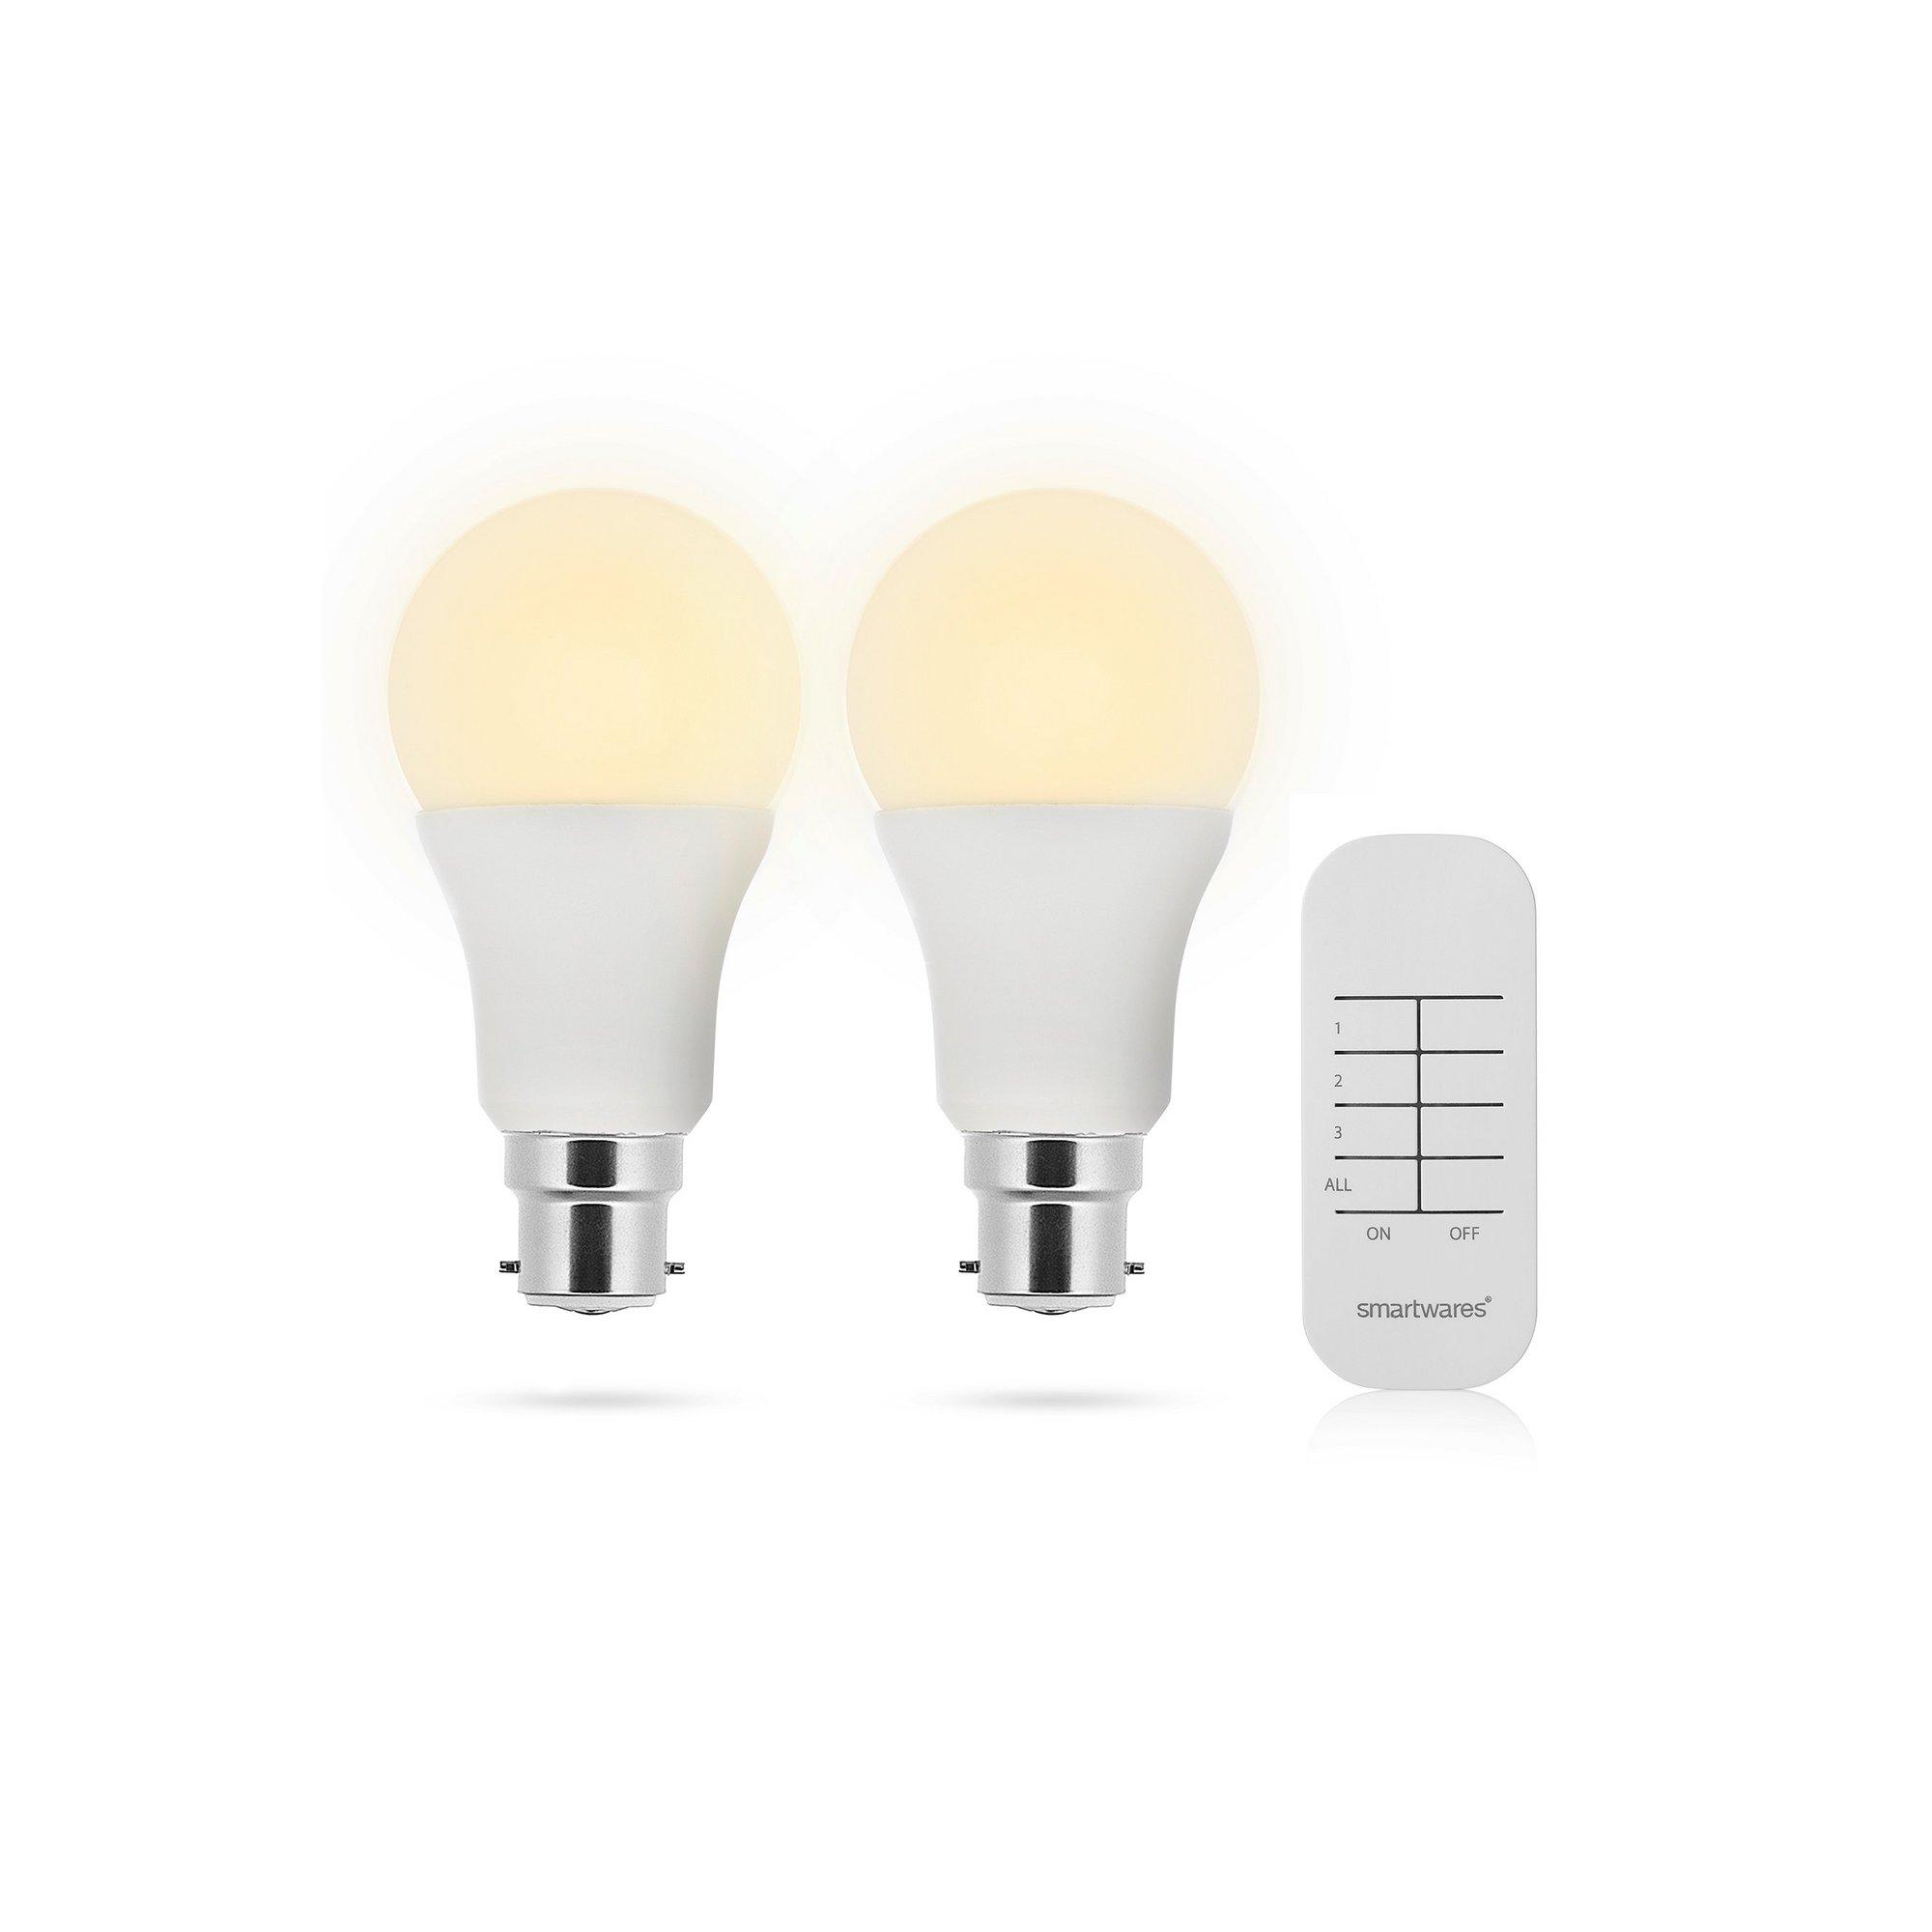 Image of Smartwares LED Lightbulb with Remote